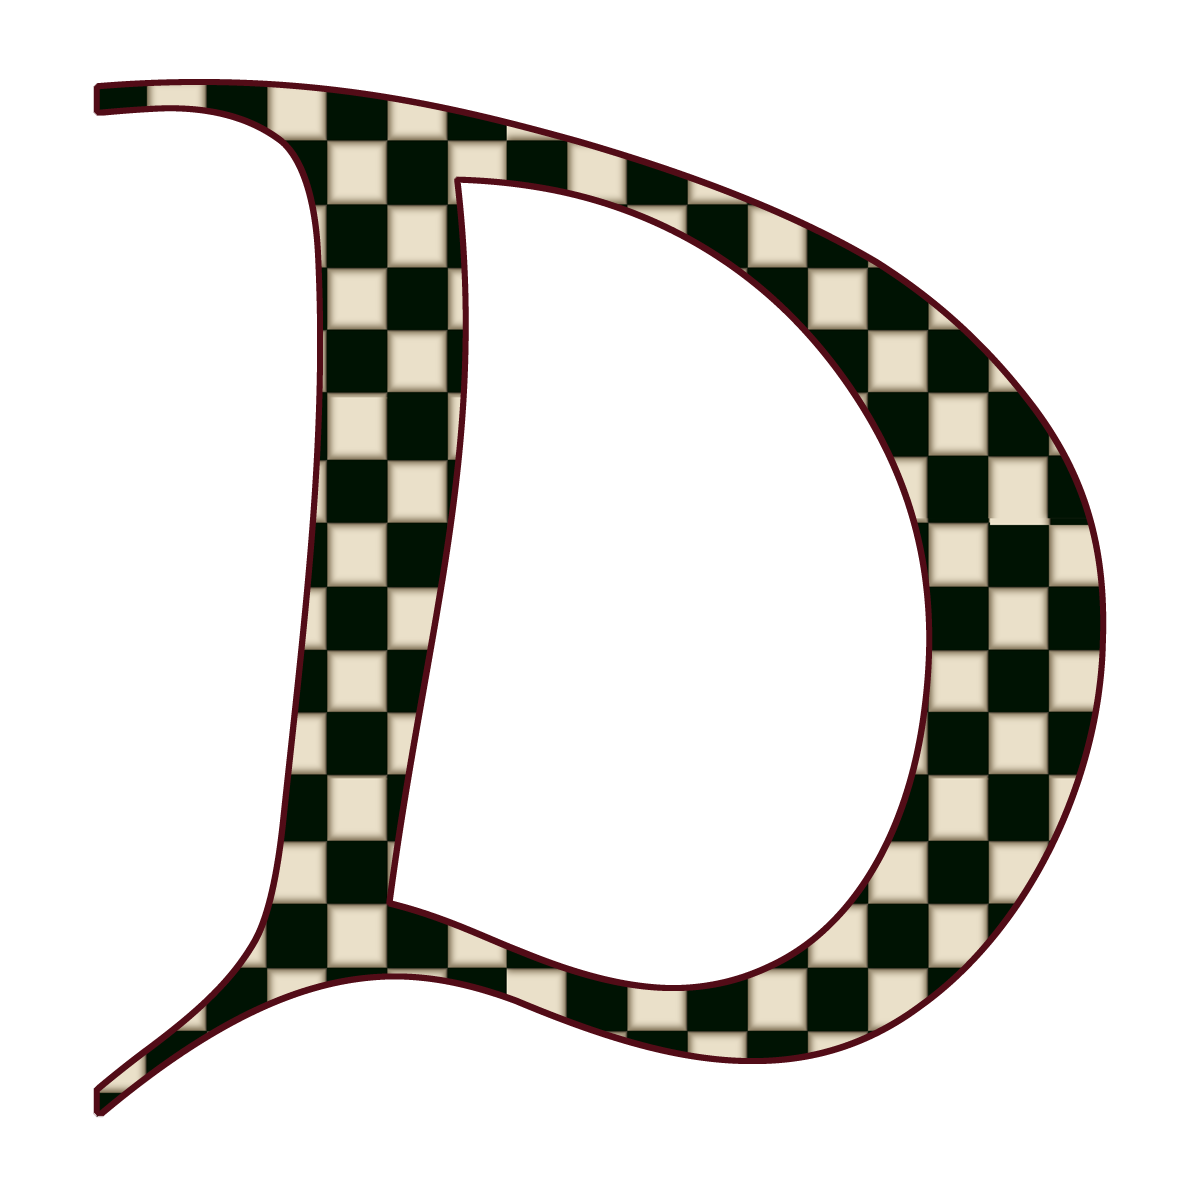 Letter d hd png transparent letter d hdg images pluspng letter d png letter d hd png thecheapjerseys Gallery